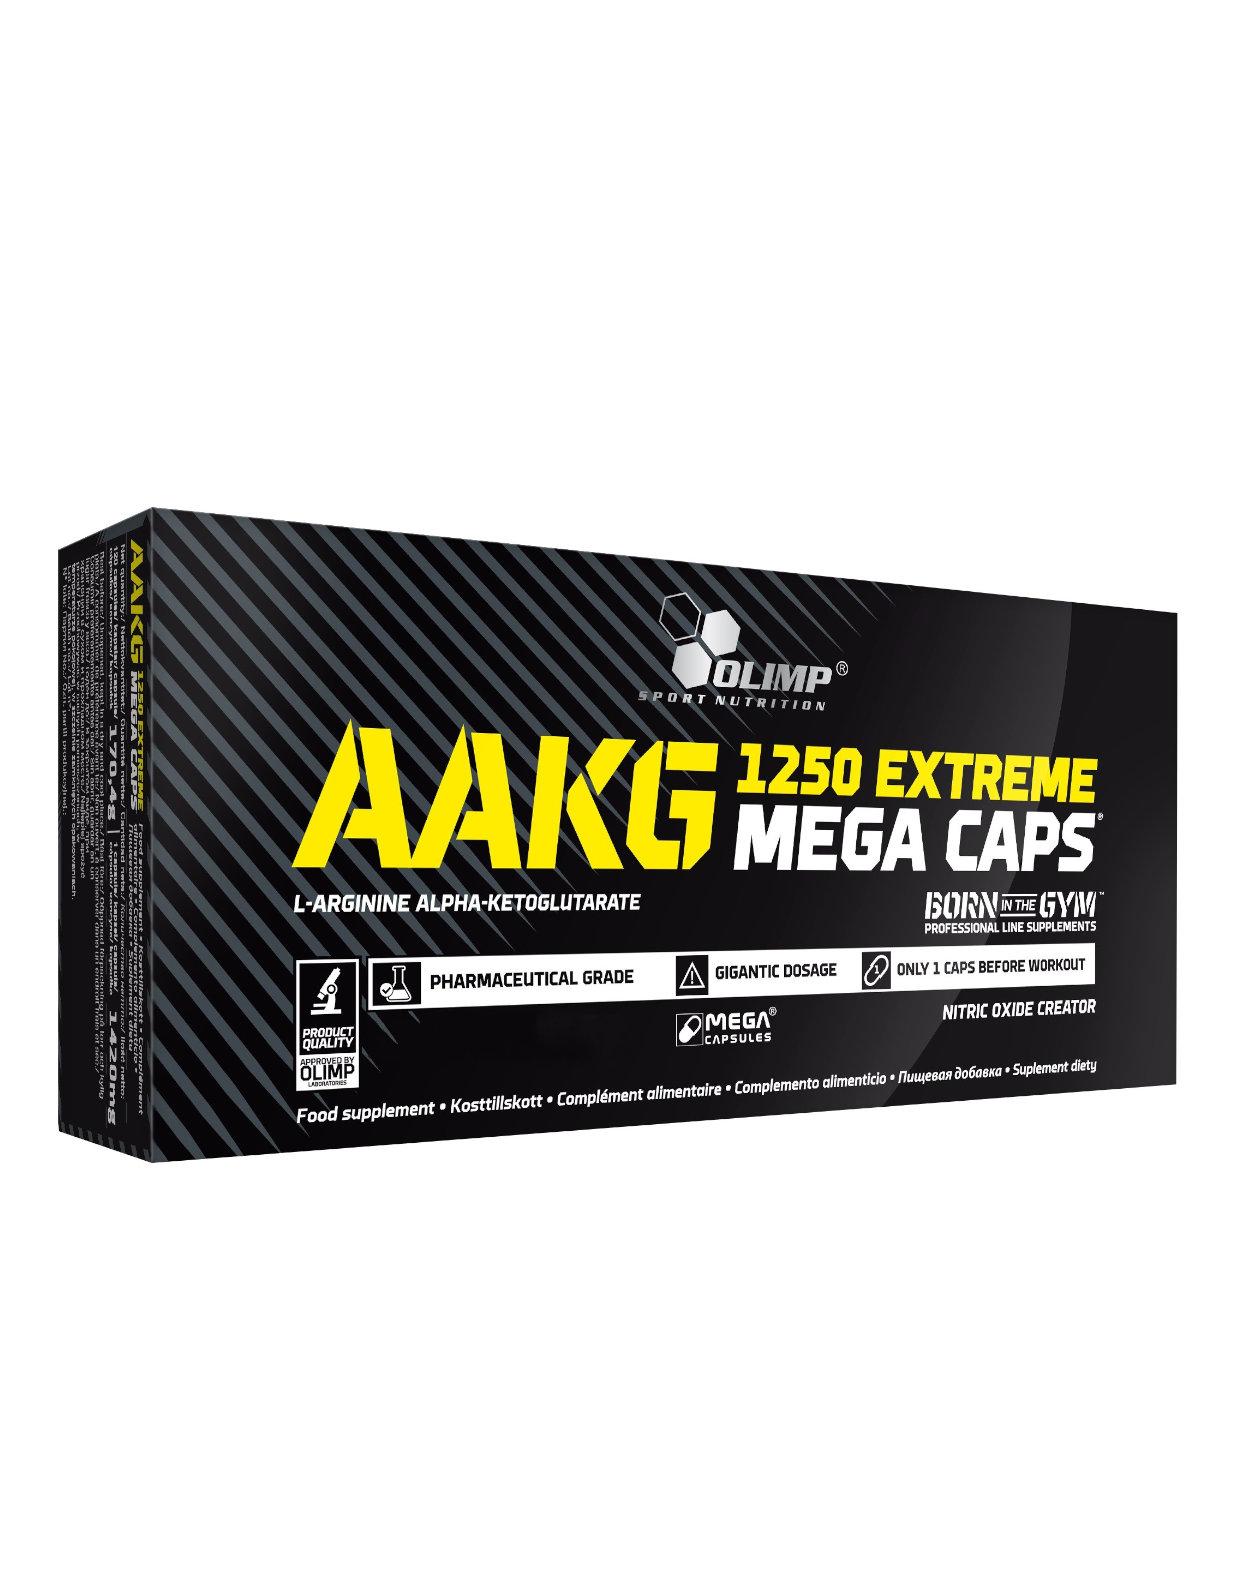 7d3e59d740a AAKG Extreme Mega Caps 1250 by OLIMP (300 capsules)